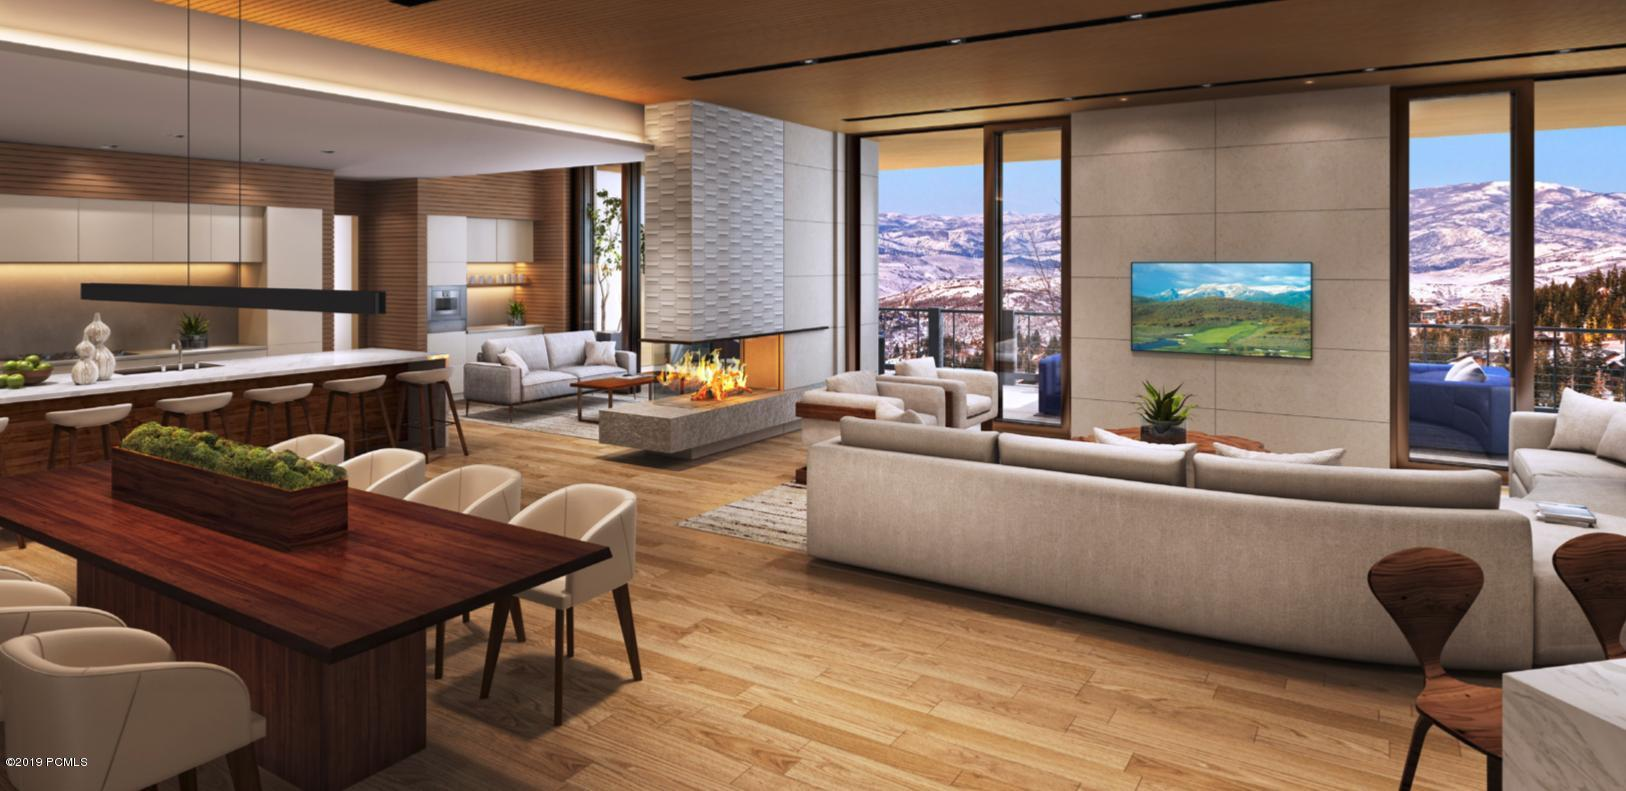 8680 Empire Club Drive, Park City, Utah 84060, 5 Bedrooms Bedrooms, ,6 BathroomsBathrooms,Condominium,For Sale,Empire Club Drive,11907636